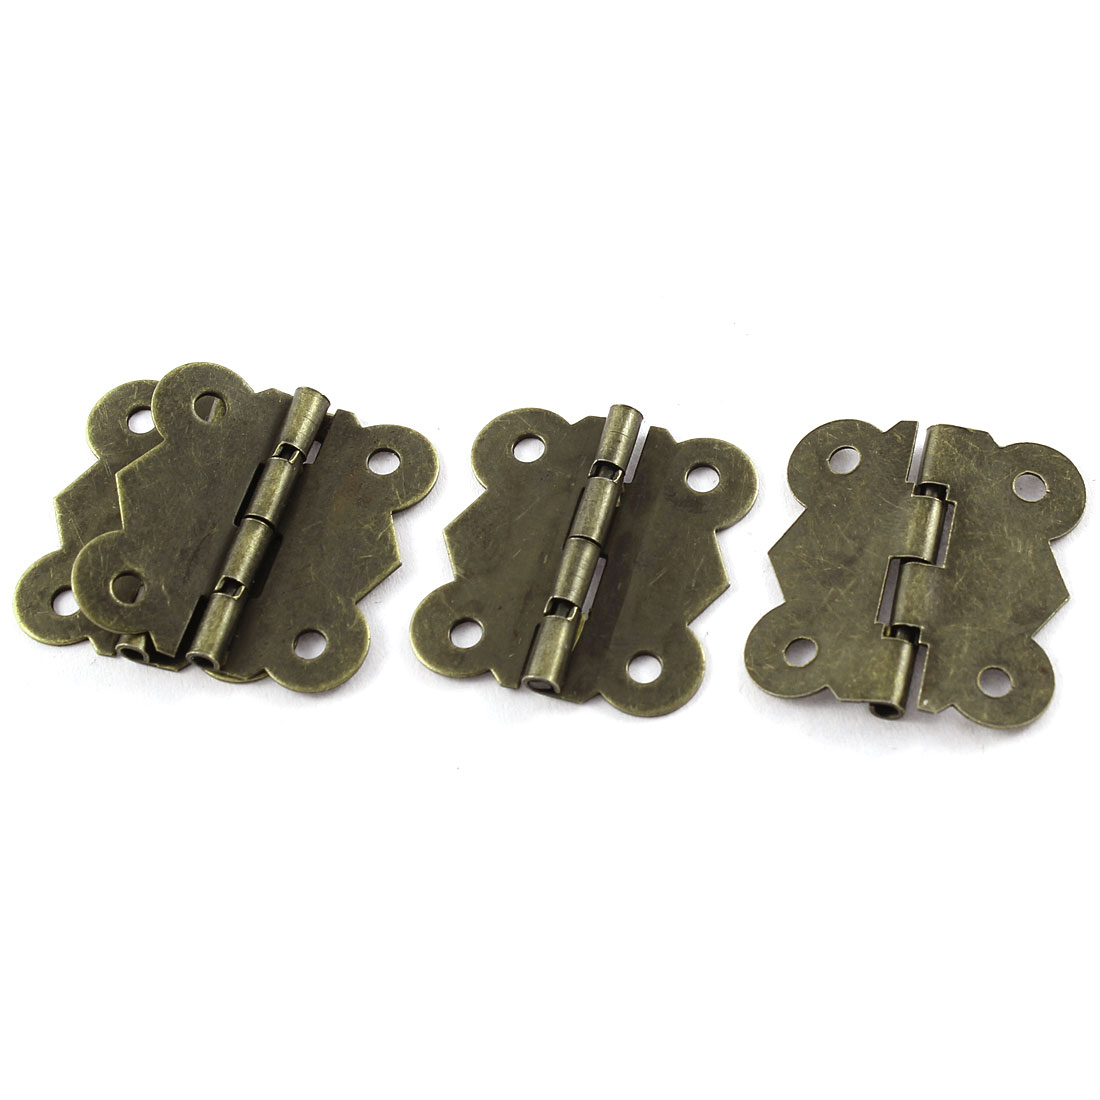 4 Pcs Bronze Tone Butterfly Style DIY Repair Cabinet Drawer Door Hinge